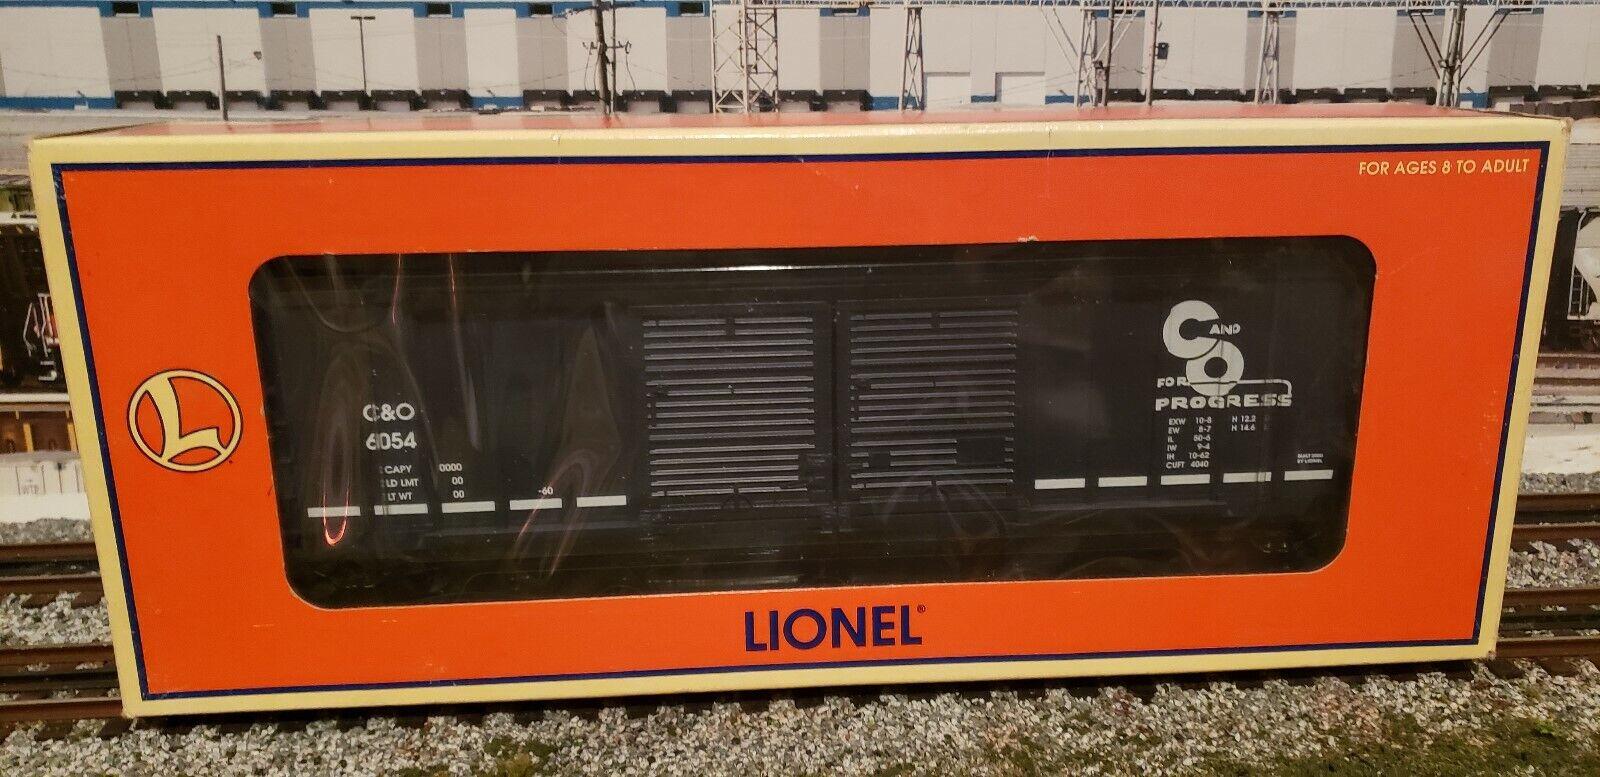 NIB LIONEL CHESAPEAKE & OHIO DOUBLE DOOR BOXCAR